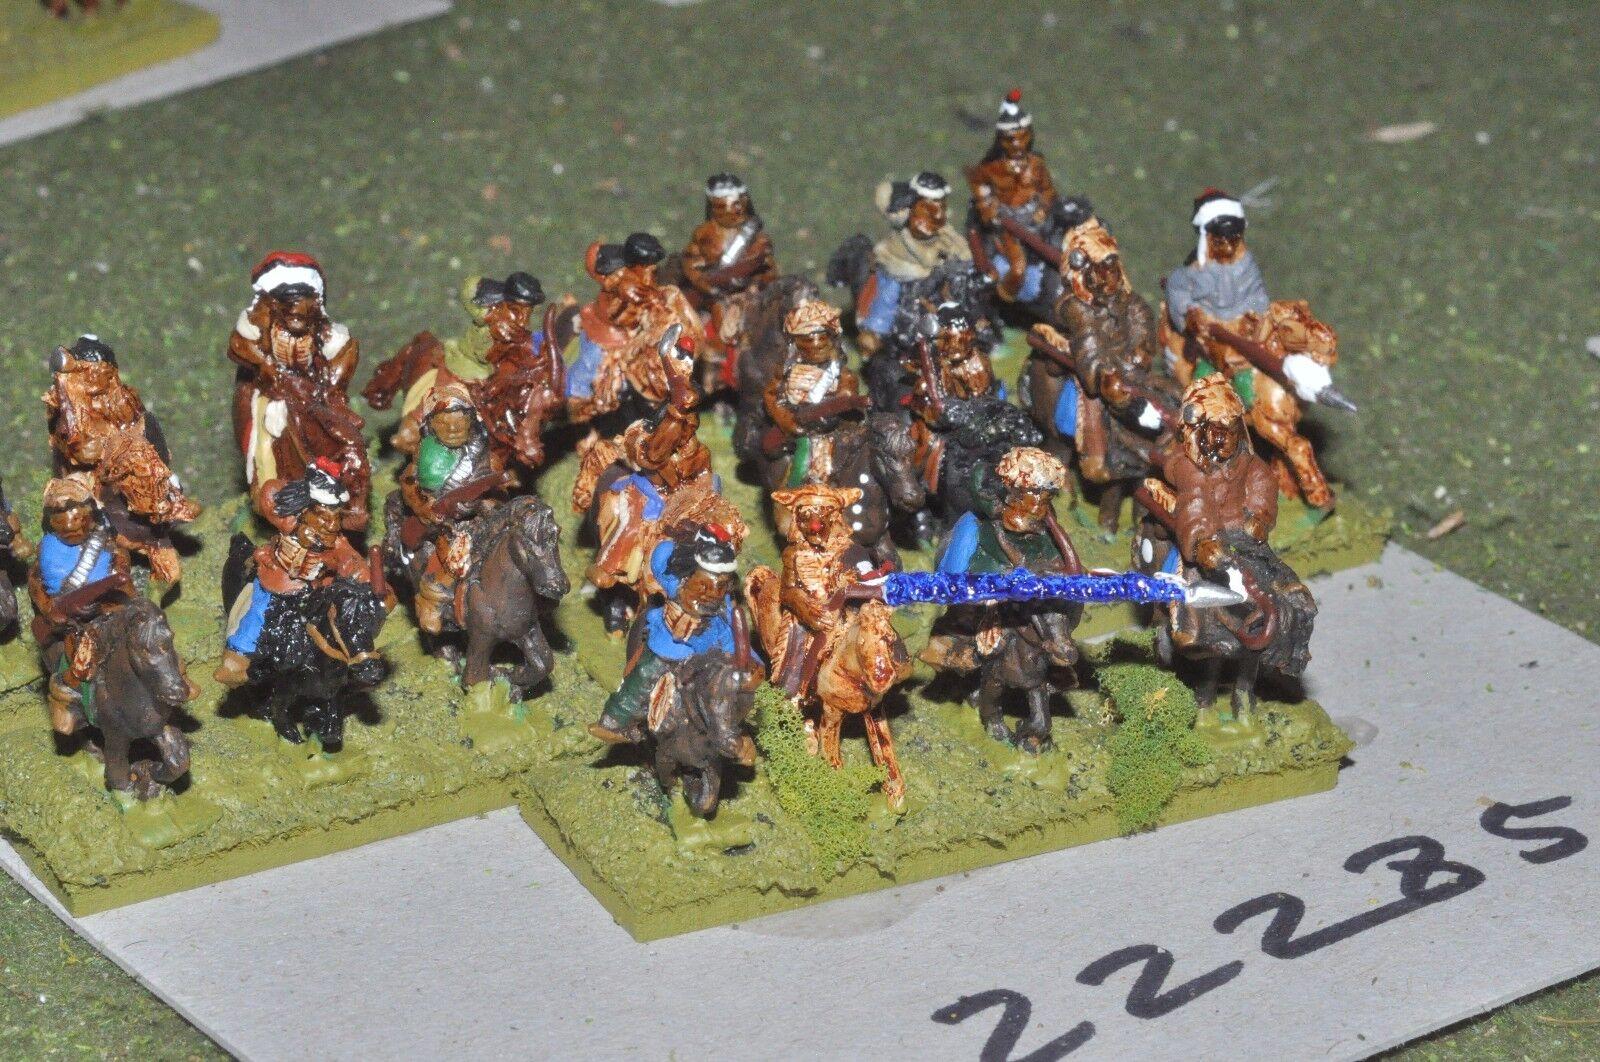 15 acw   indianer - alte west - krieger 20 zahlen kavallerie - cav (22285)